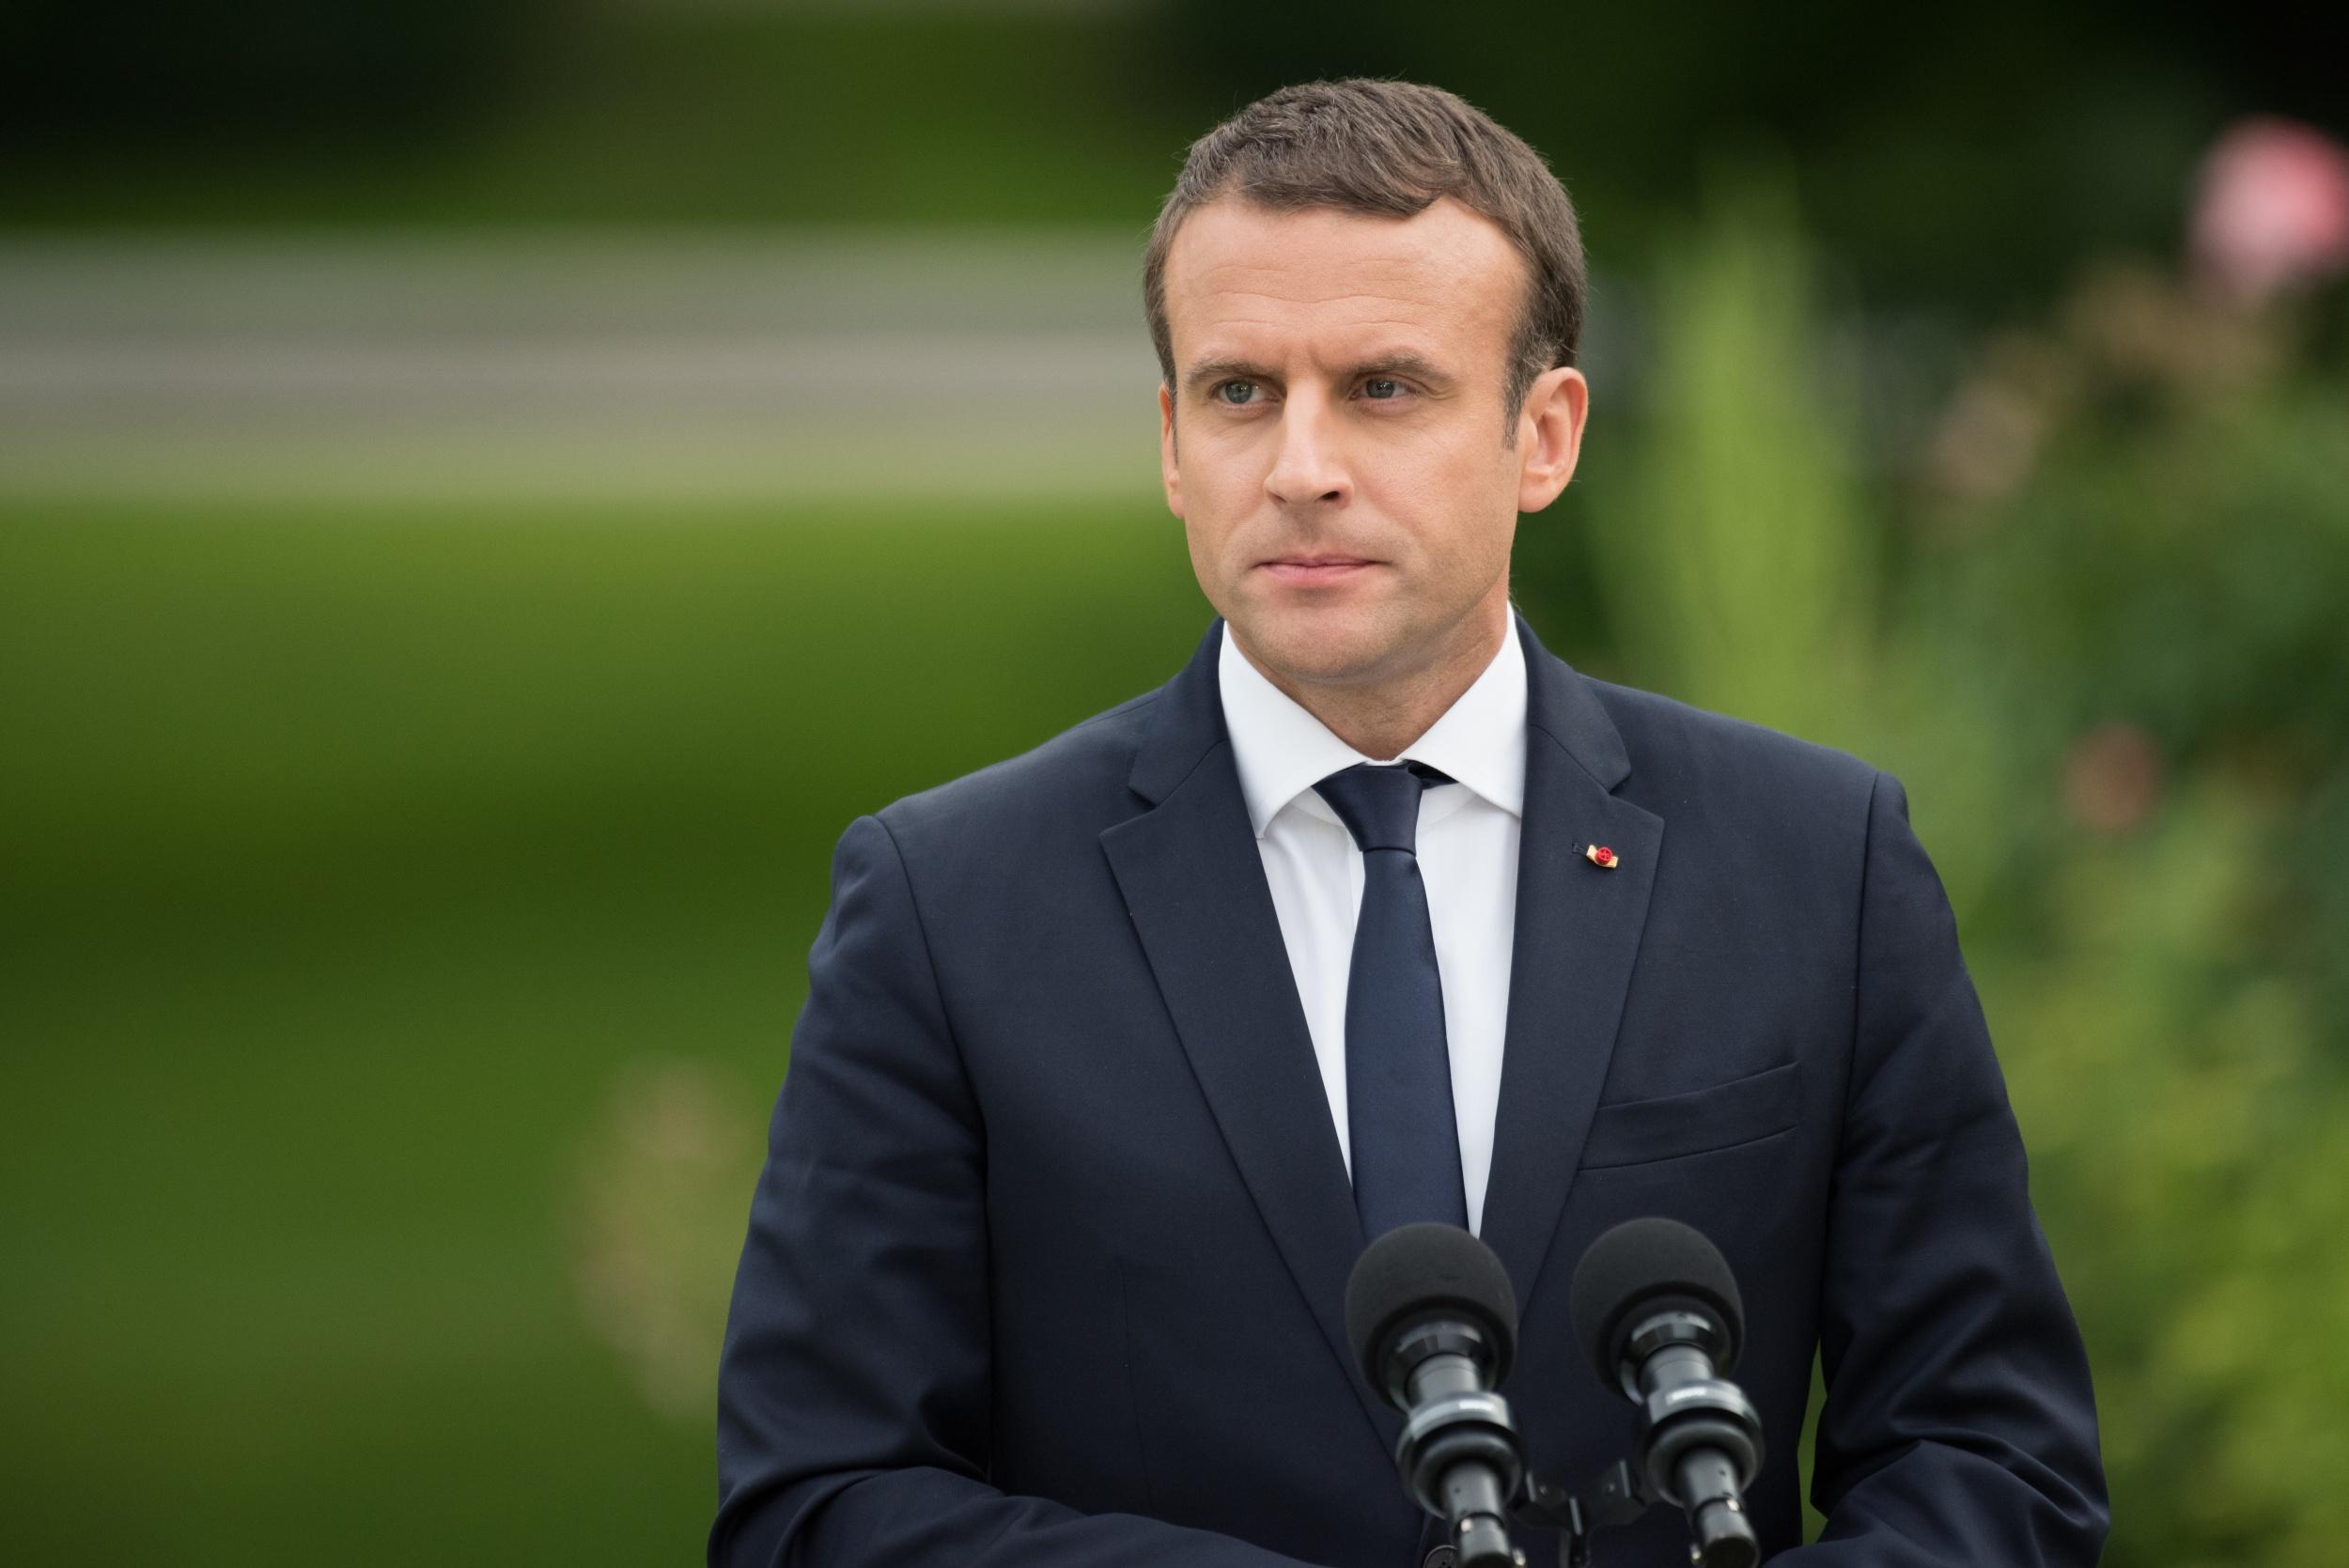 Emmanuel Macron Biografia Do Presidente Frances Infoescola